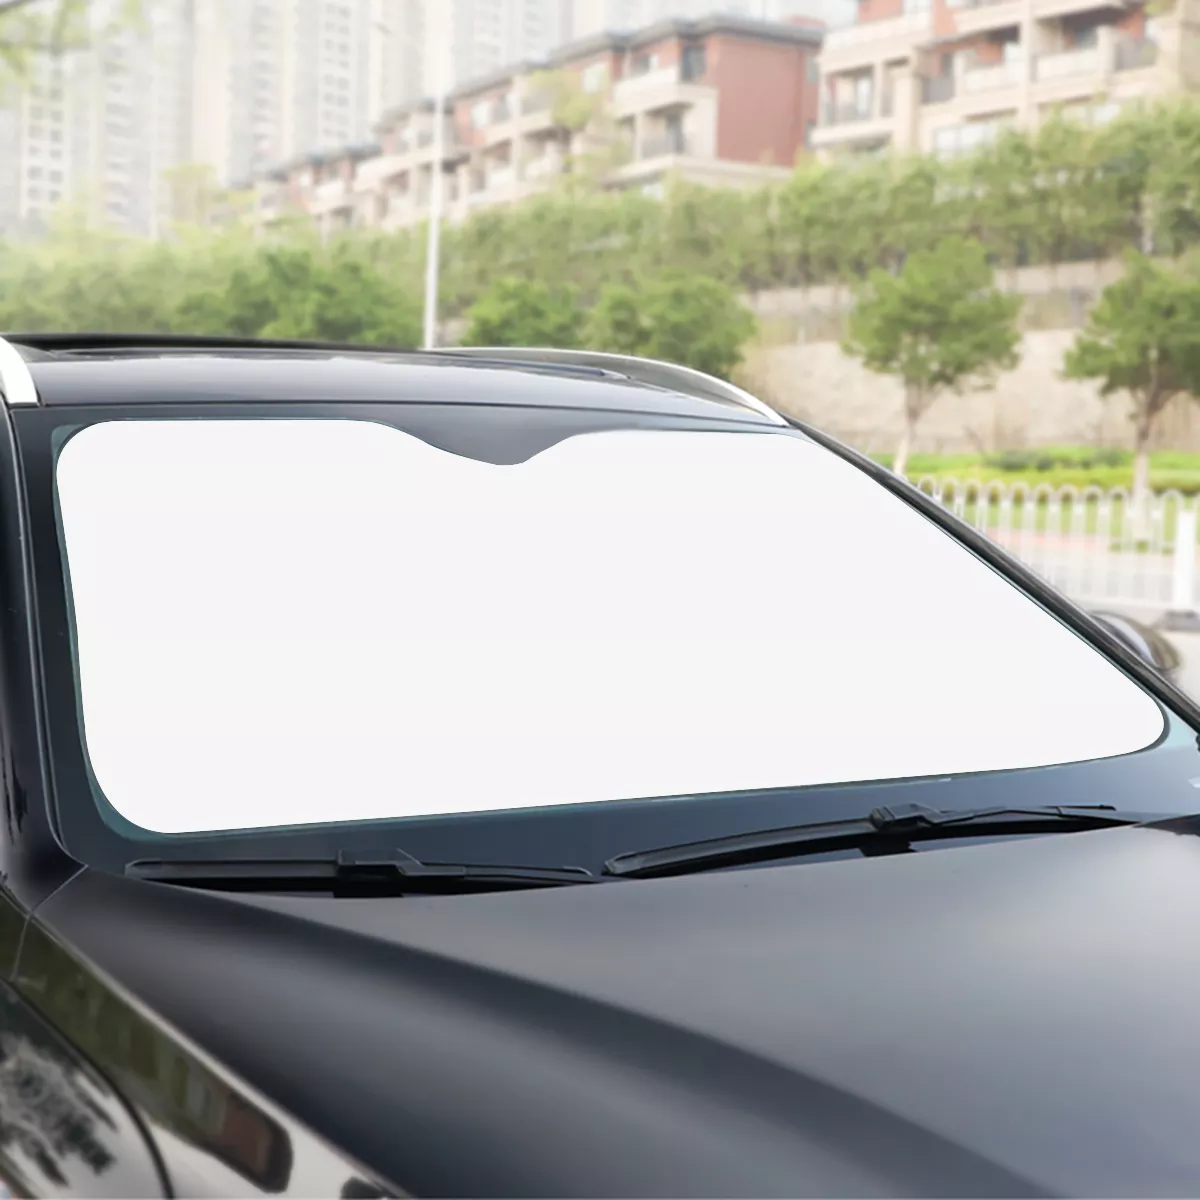 Custom windshield sunshade